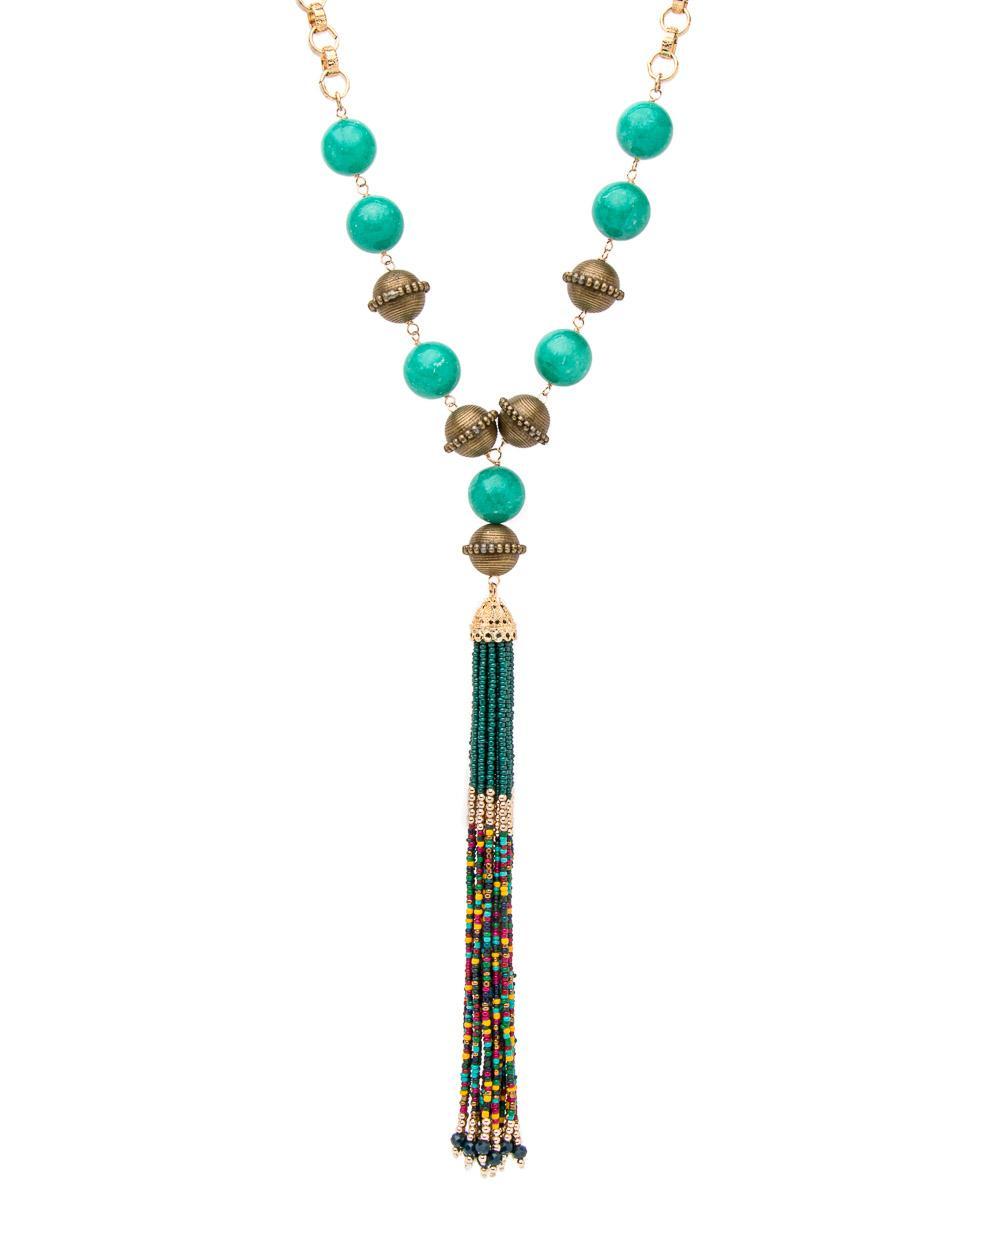 Devon Leigh Turquoise Beaded Tassel Necklace BoOkAR